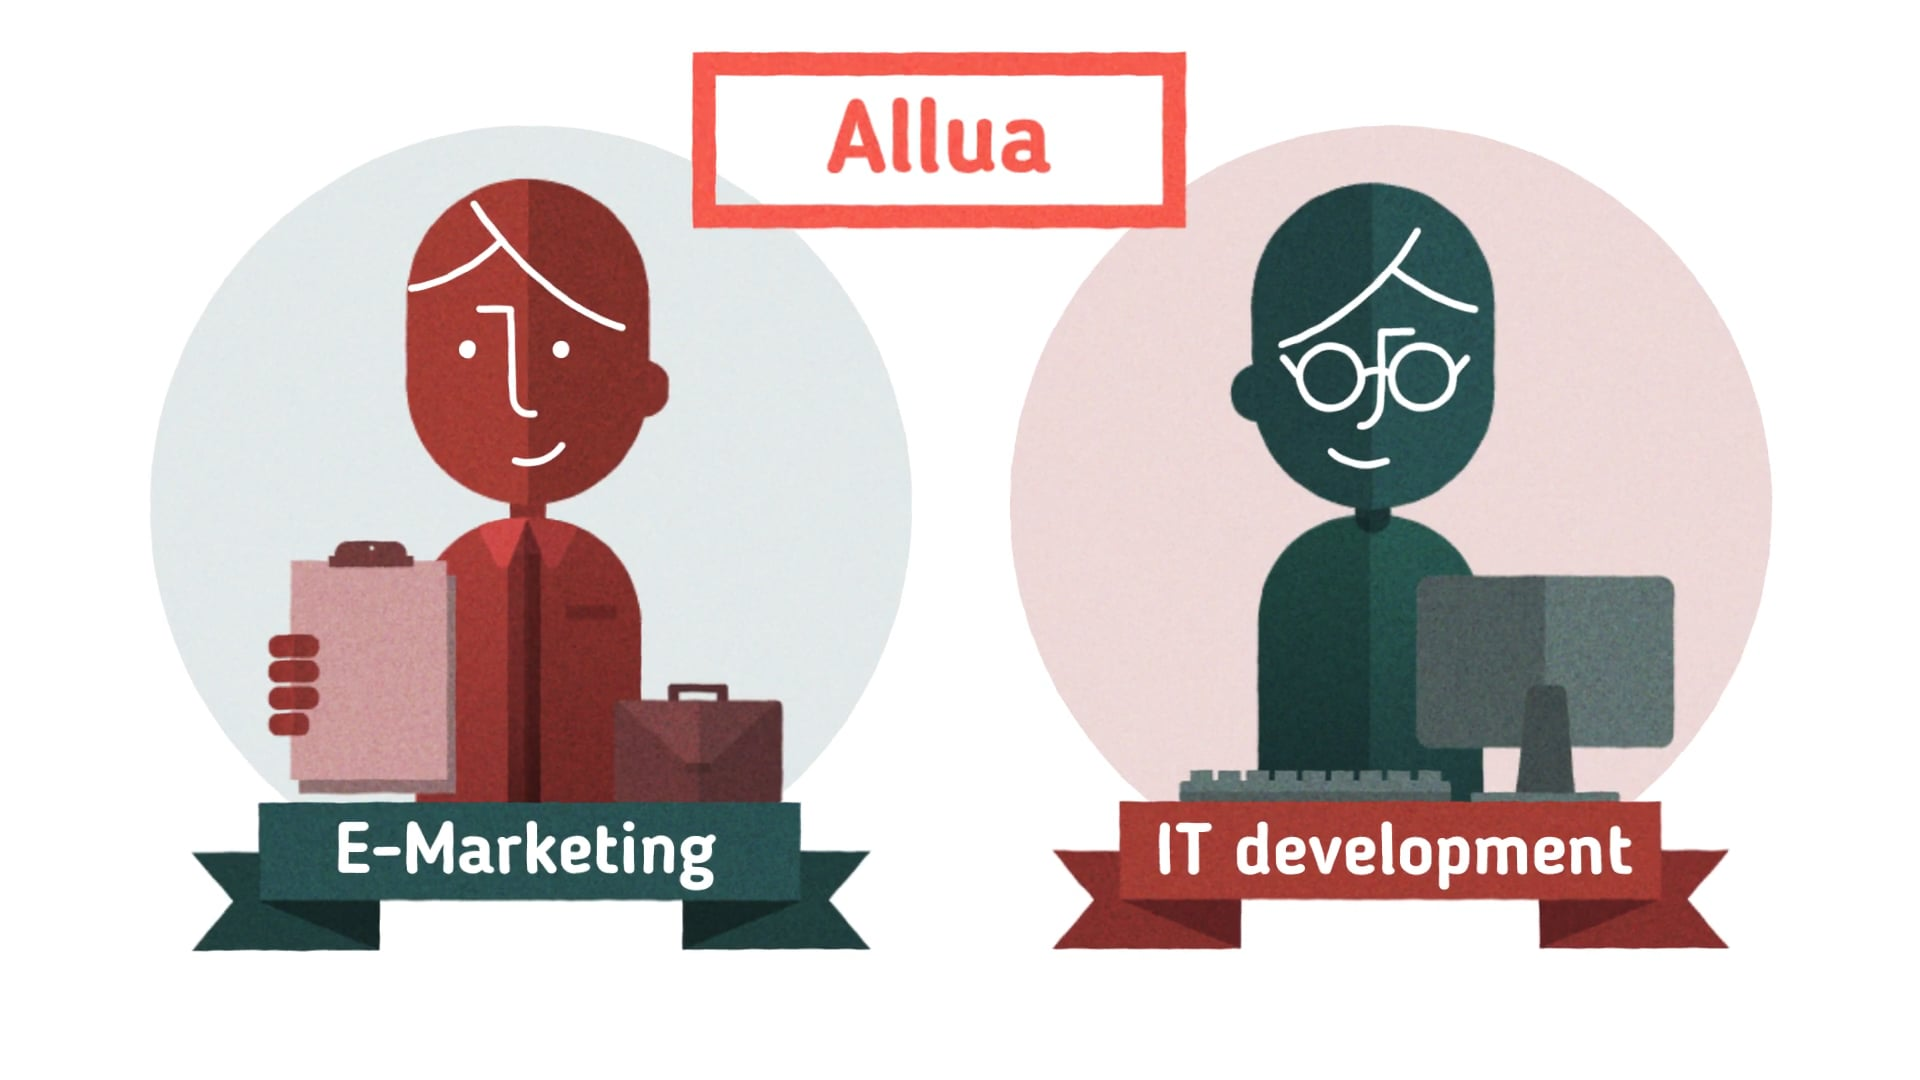 Best SEO Practices (搜索引擎排名優化簡介) by Allua Tech